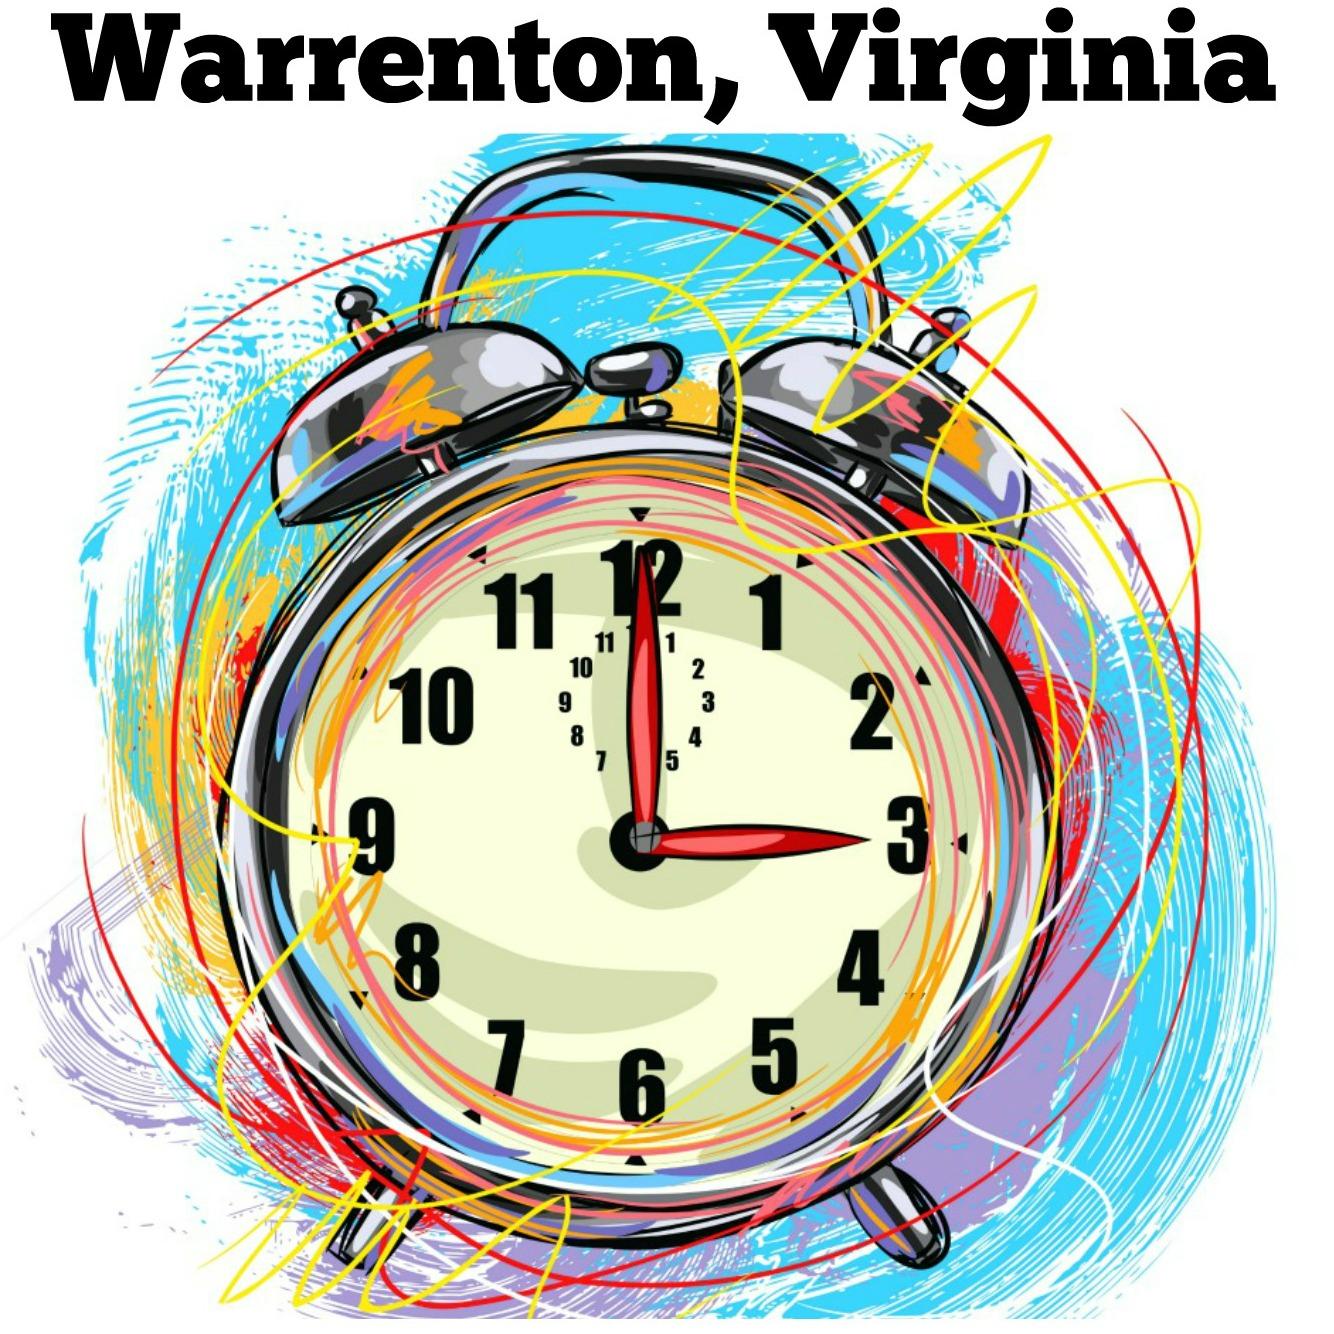 Homes for sale in Warrenton, Virginia